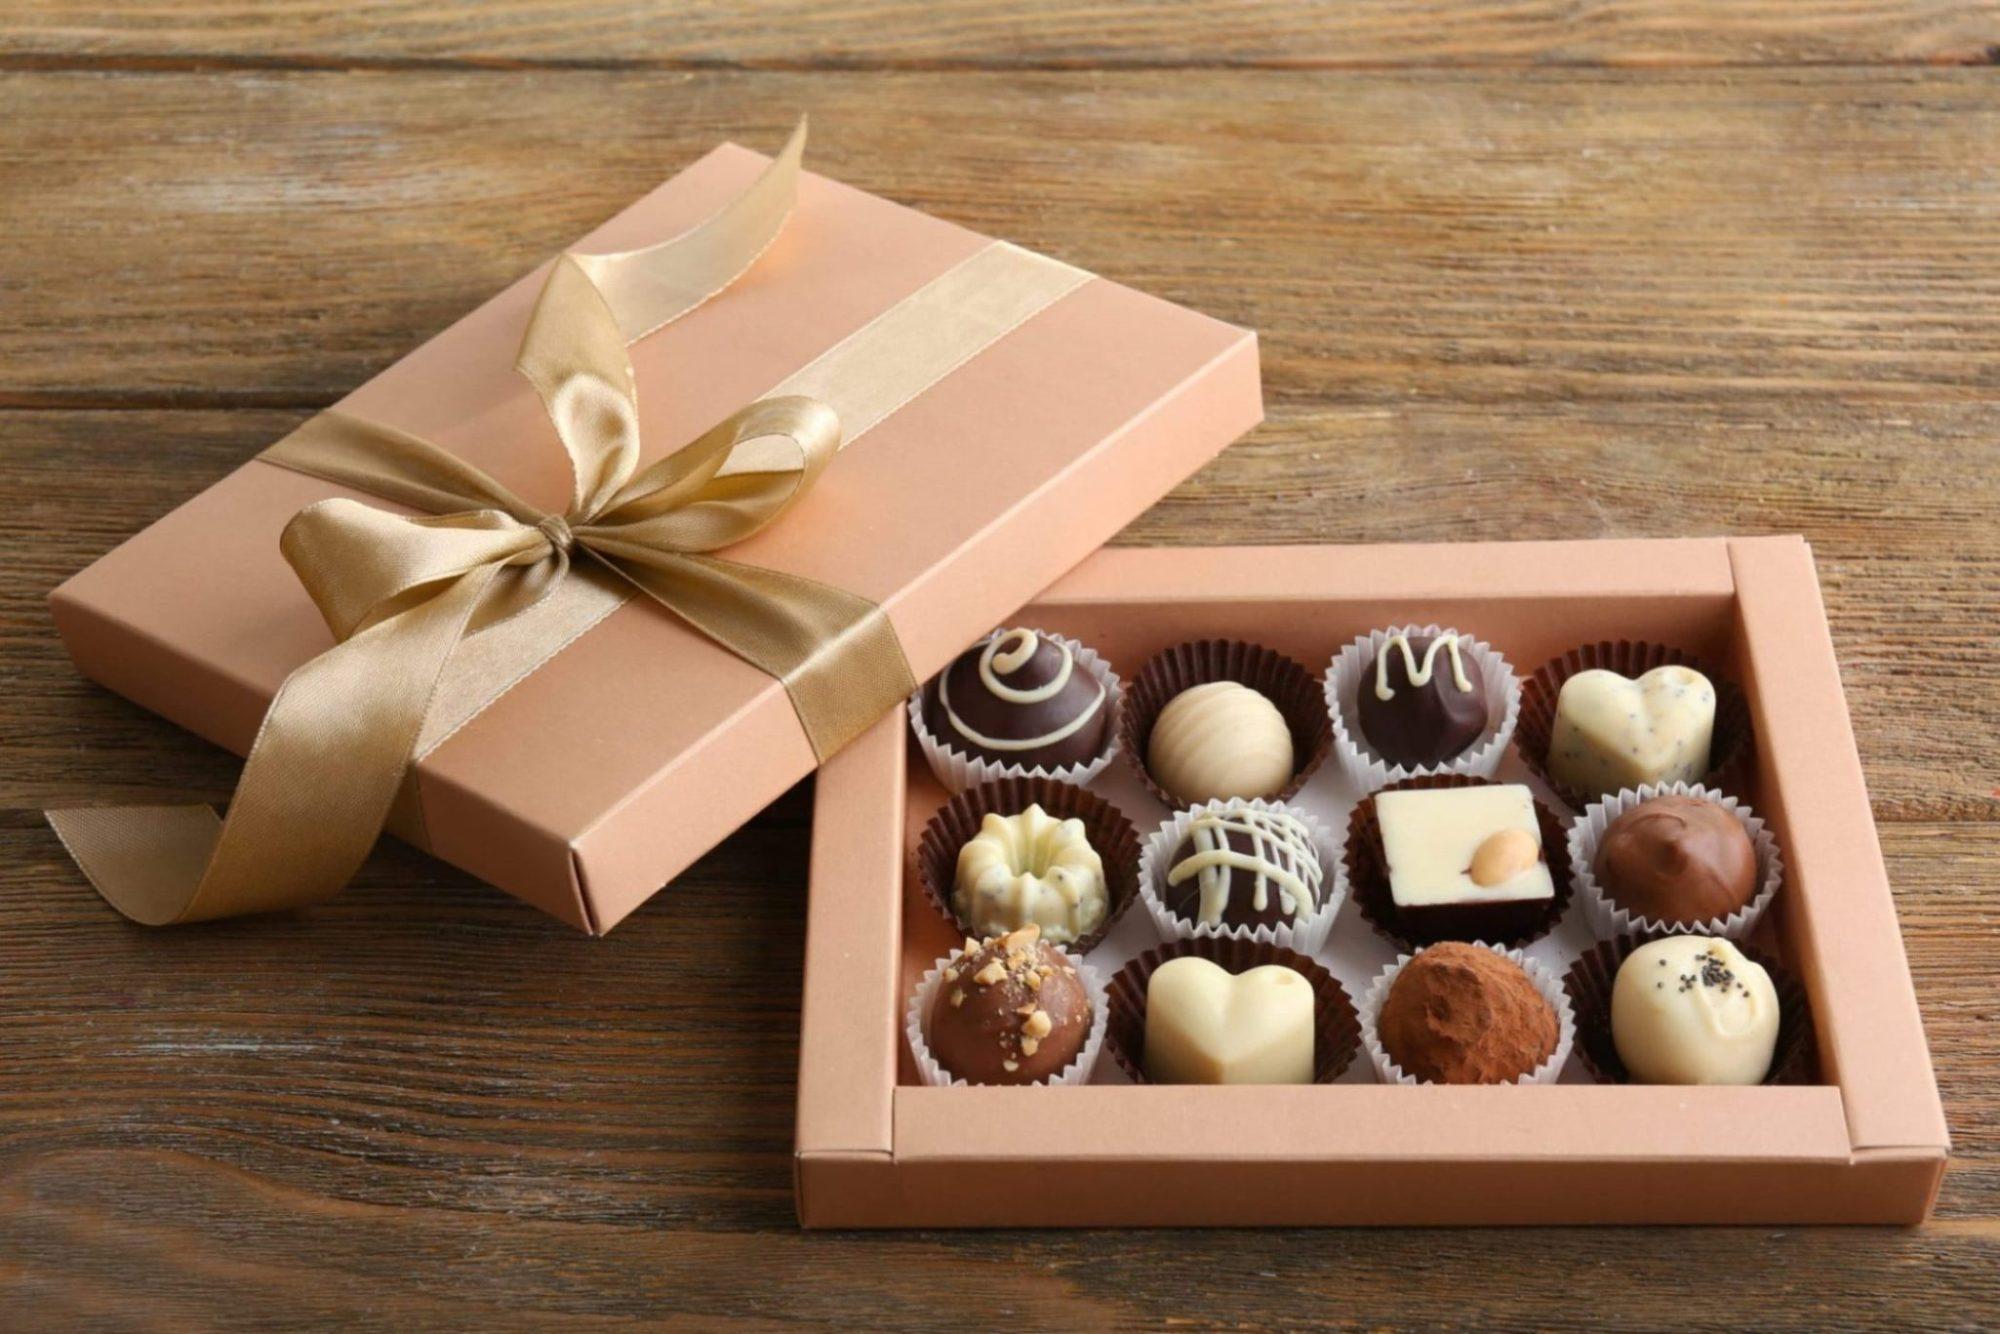 Čokoládou ke spokojenosti